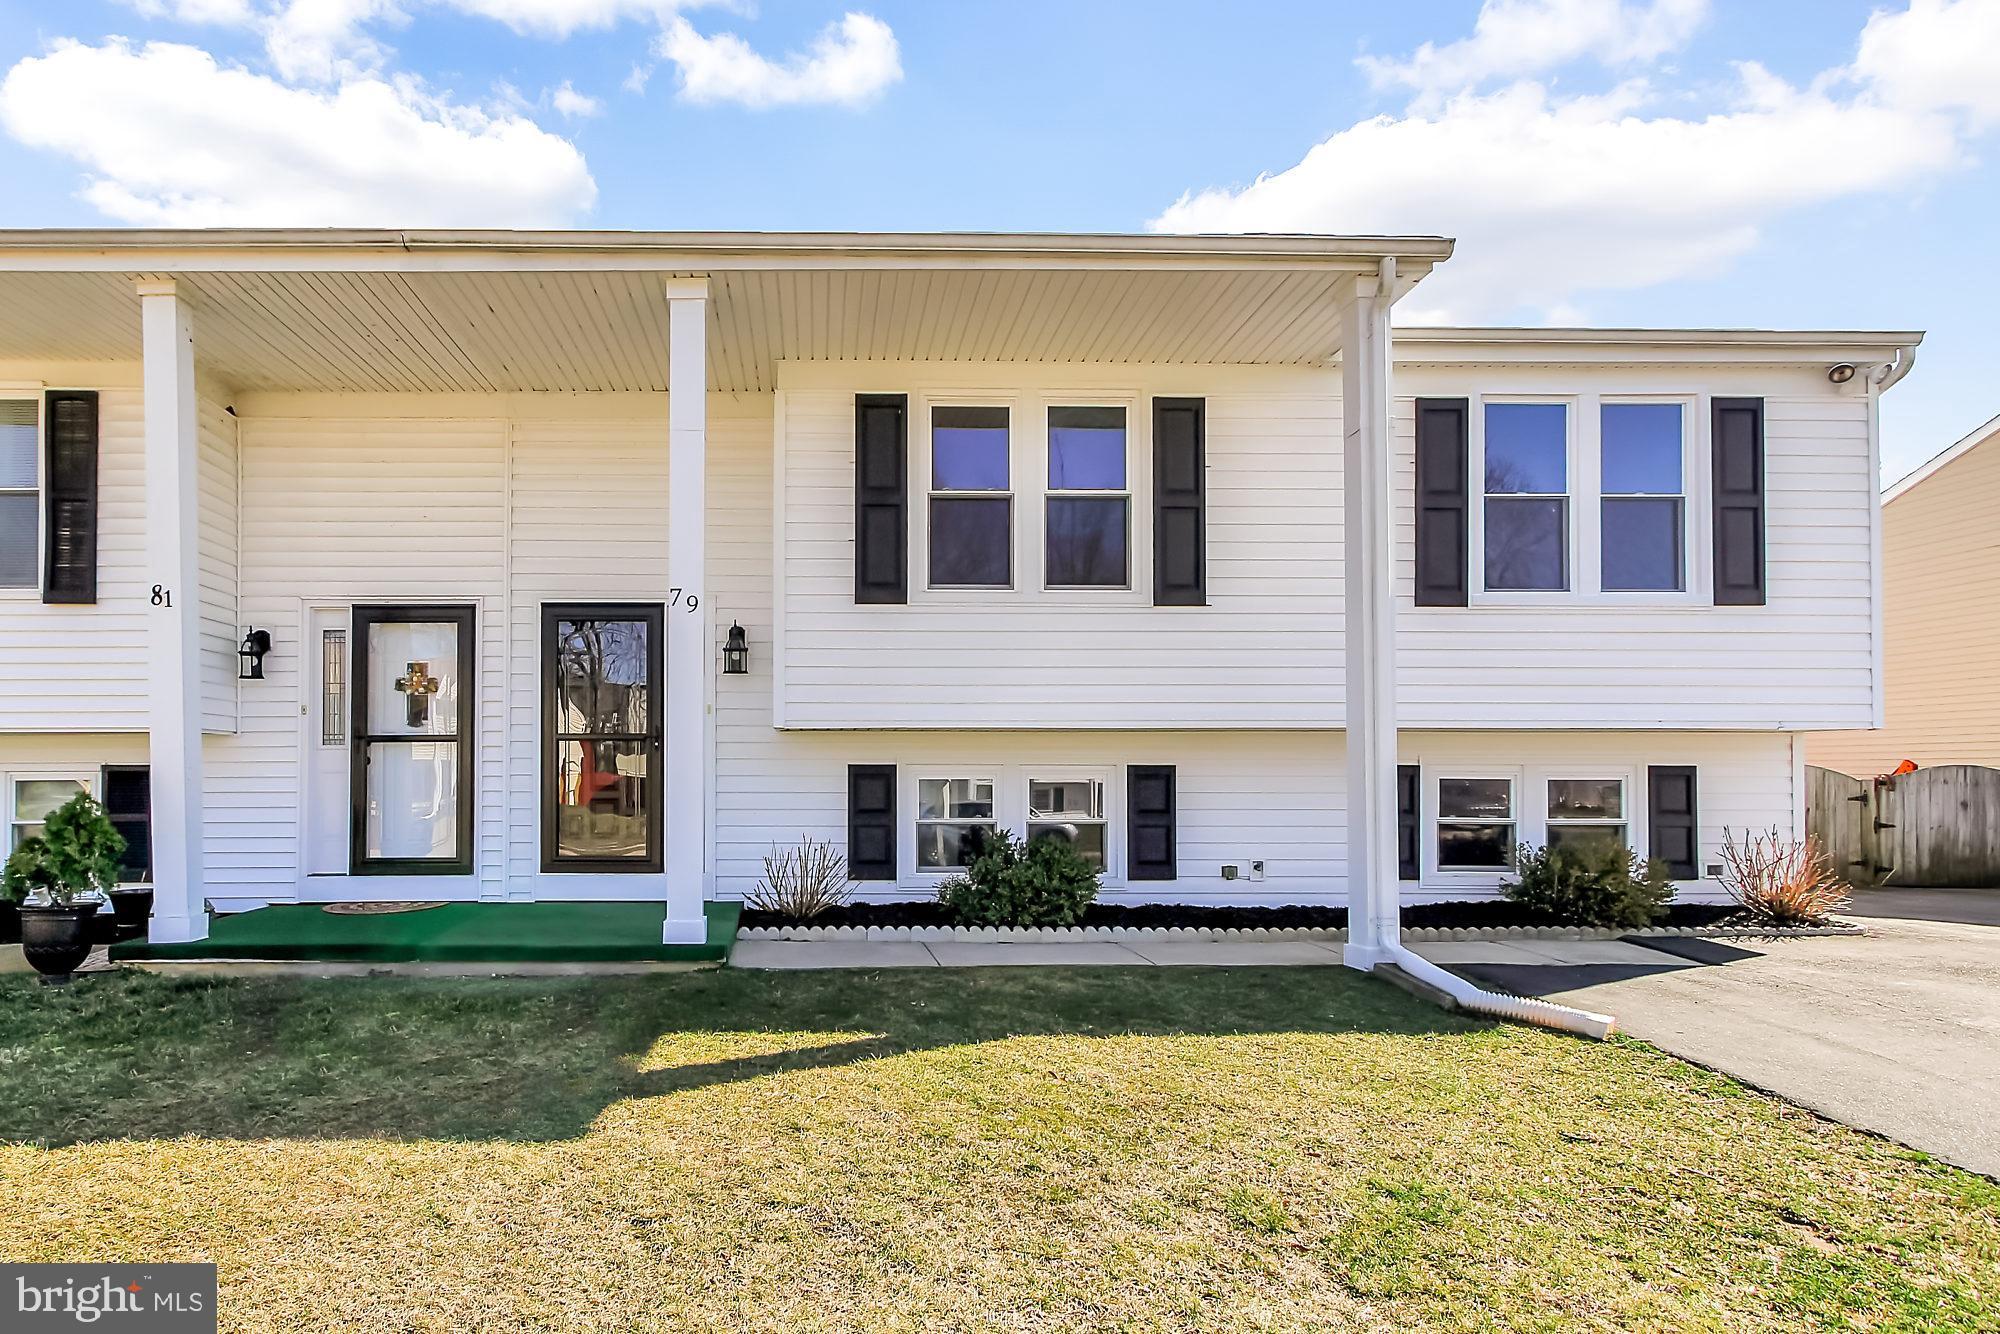 79 Haverhill Rd, Joppa, MD, 21085